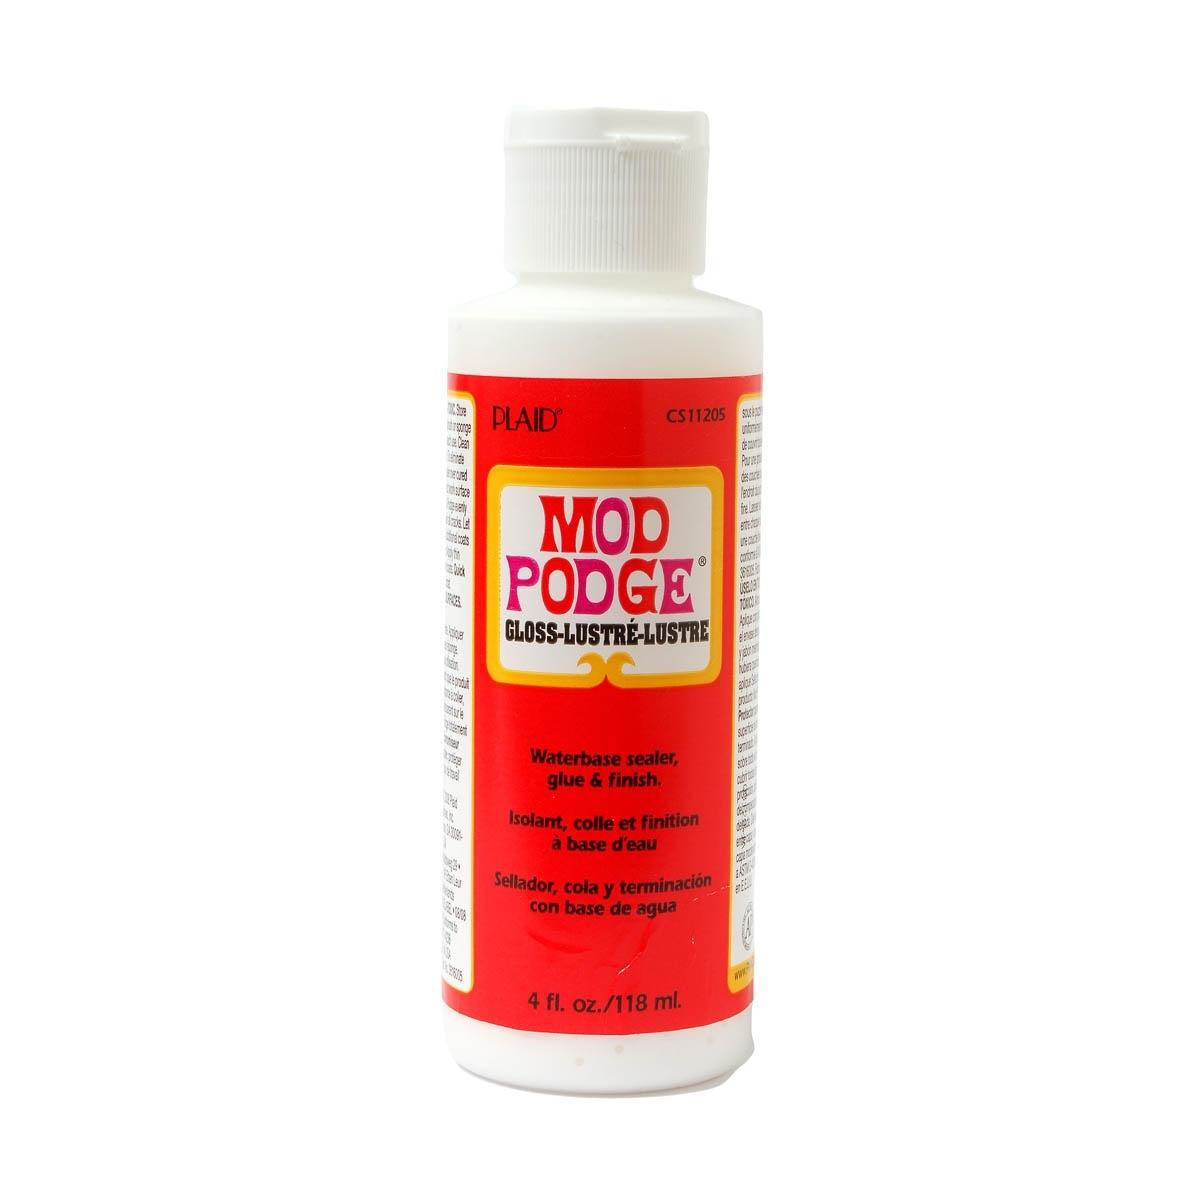 Mod Podge Gloss Water Base Sealer/Glue And Finish, White, 4 oz 118ml